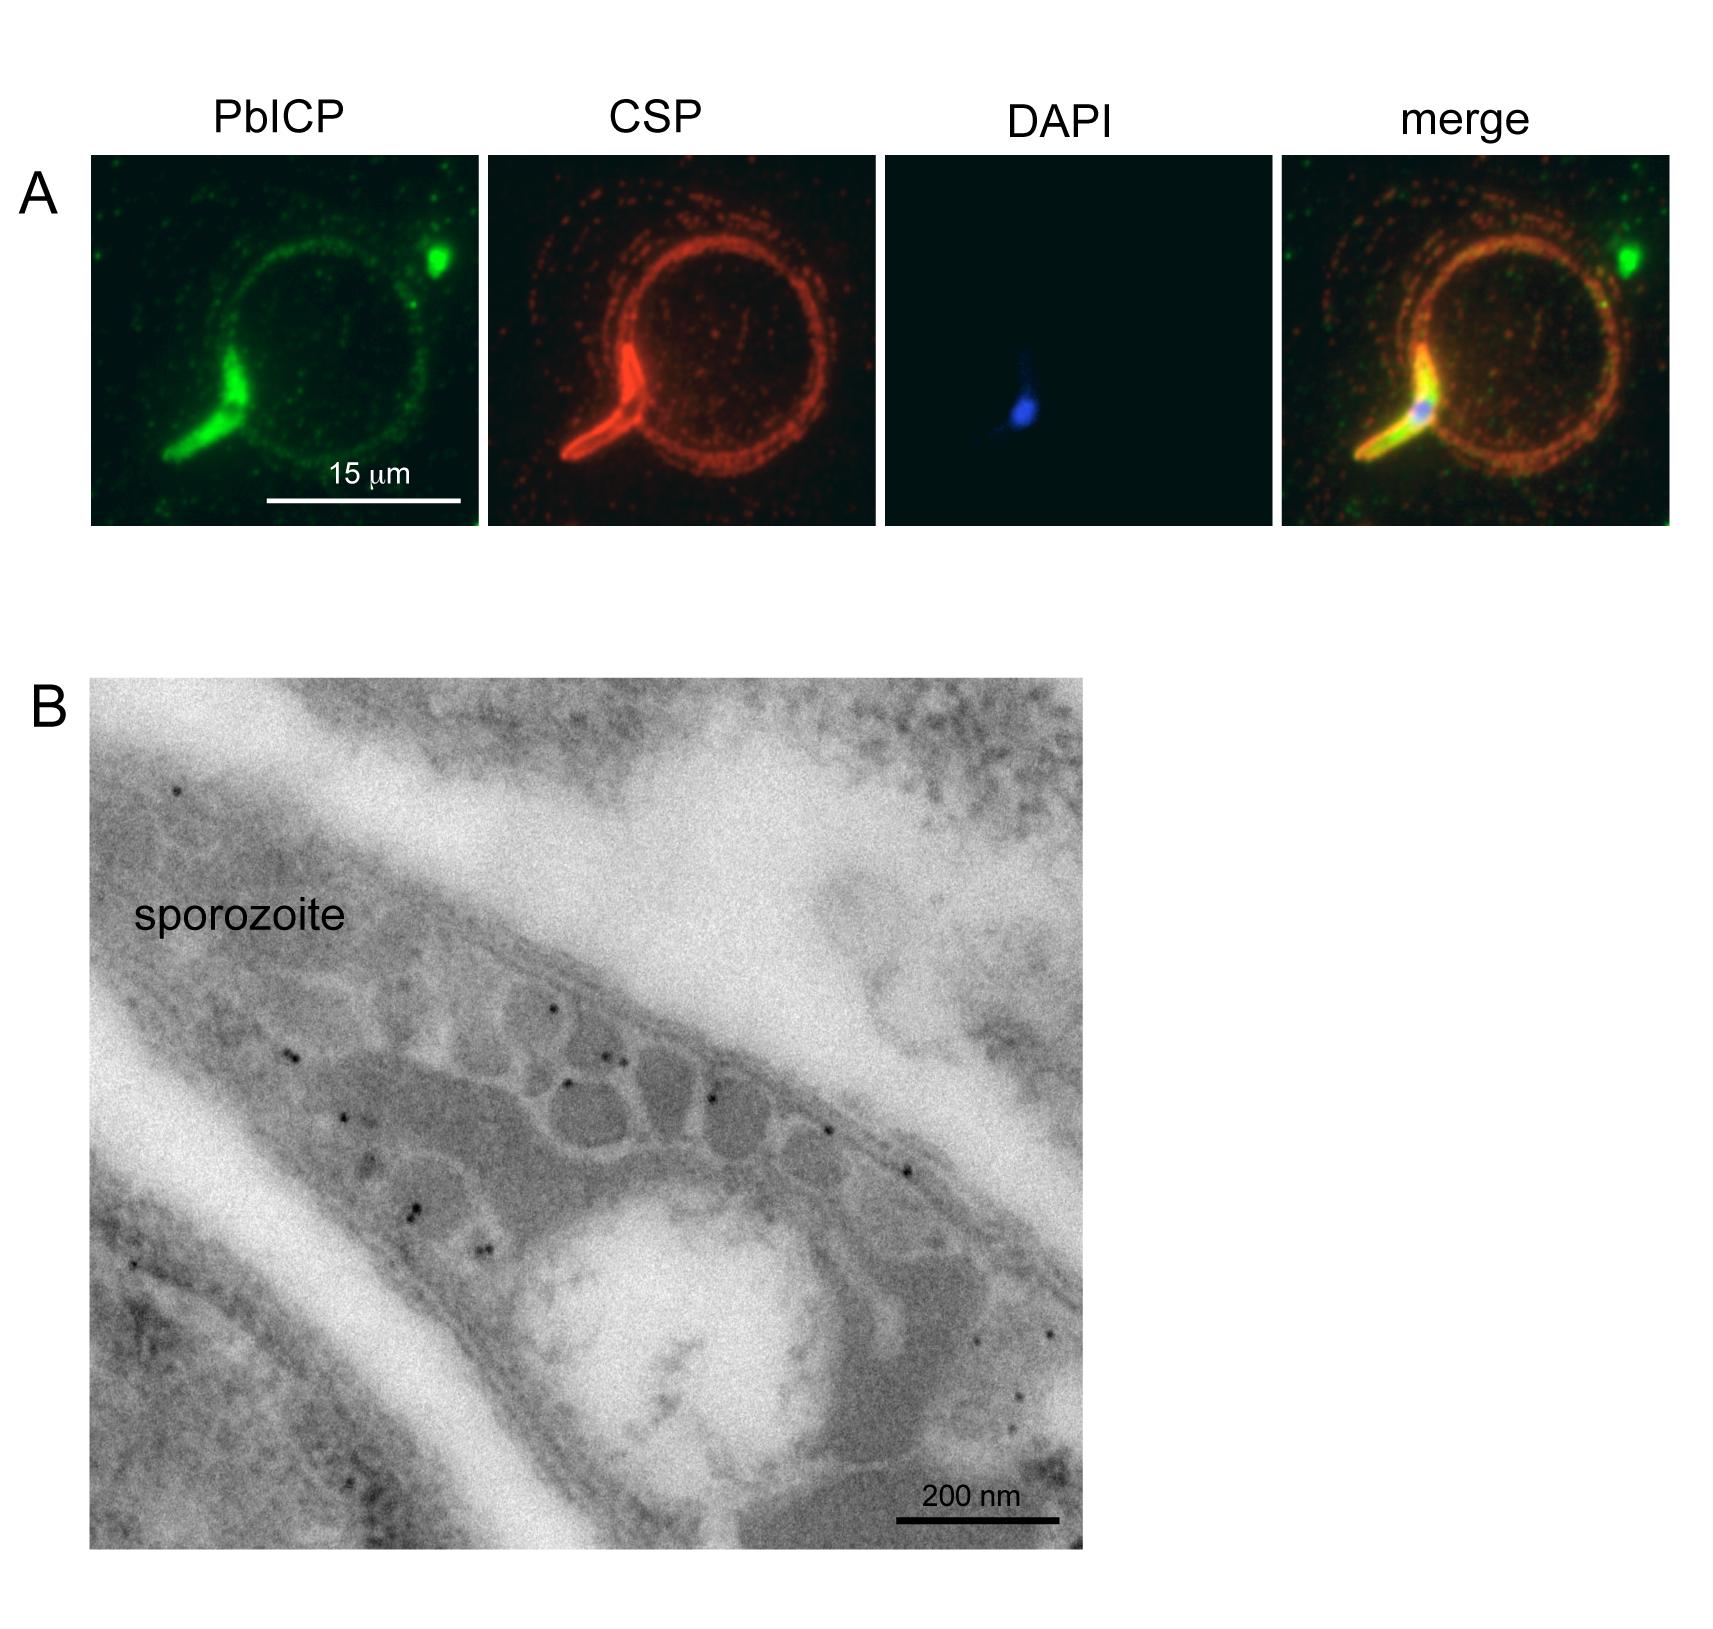 PbICP is secreted by salivary gland sporozoites.